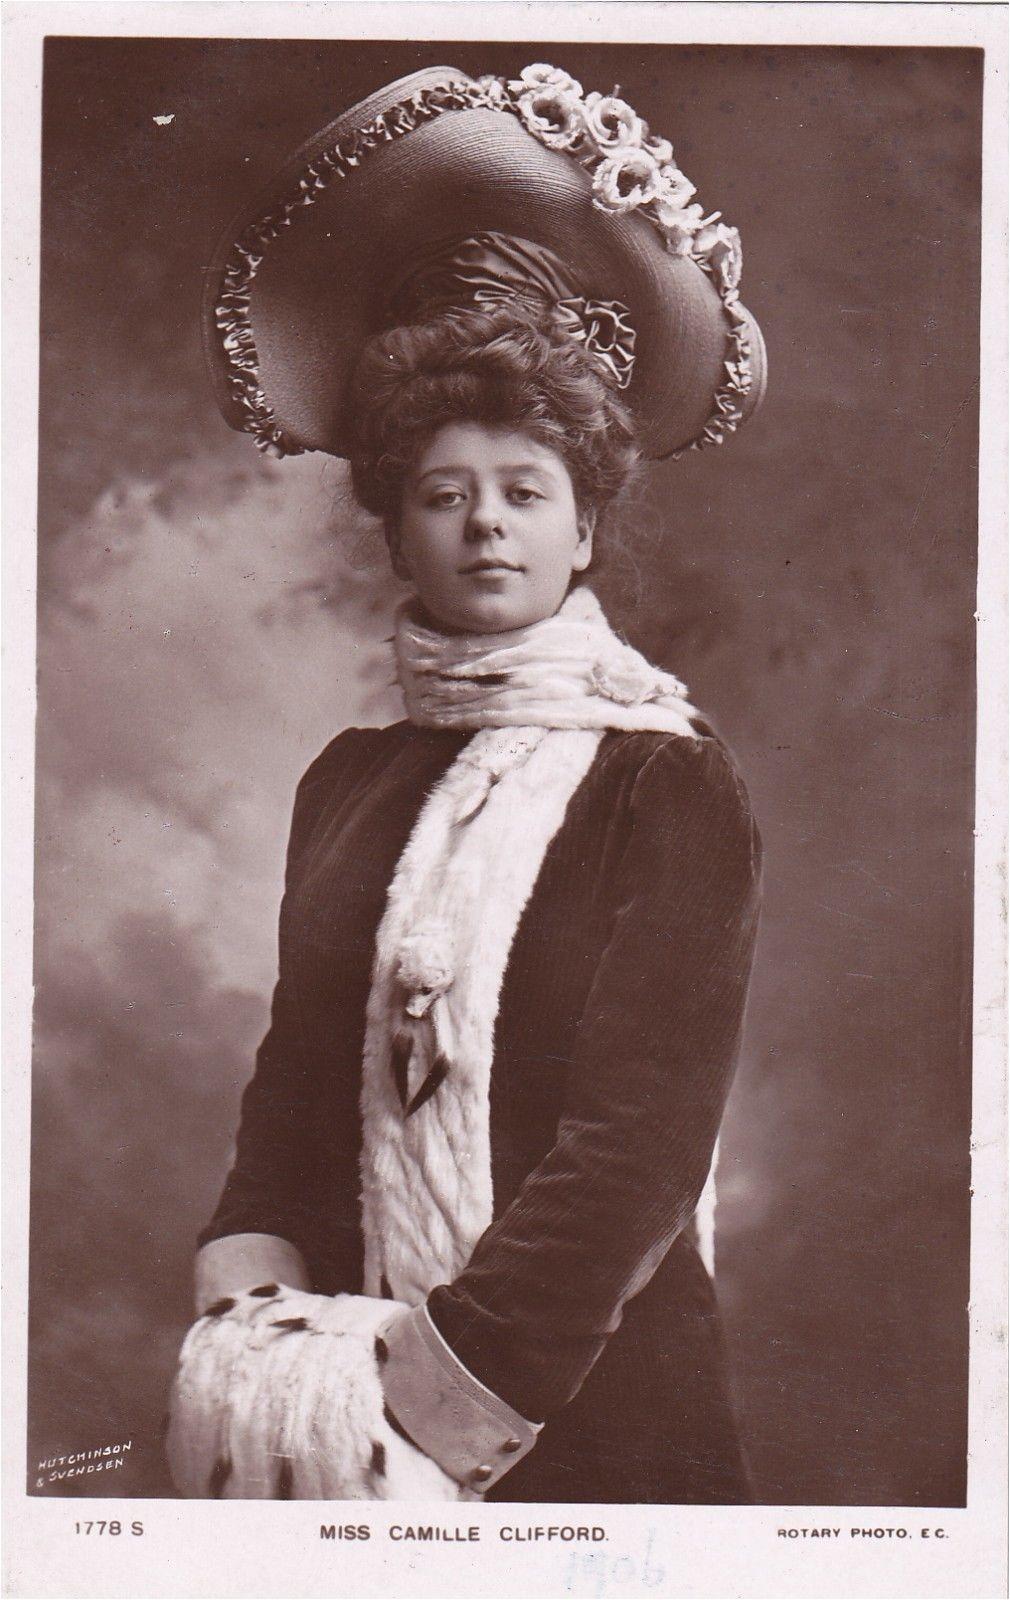 1906 British Actress Gibson Girl Camille Clifford Original Vintage Postcard